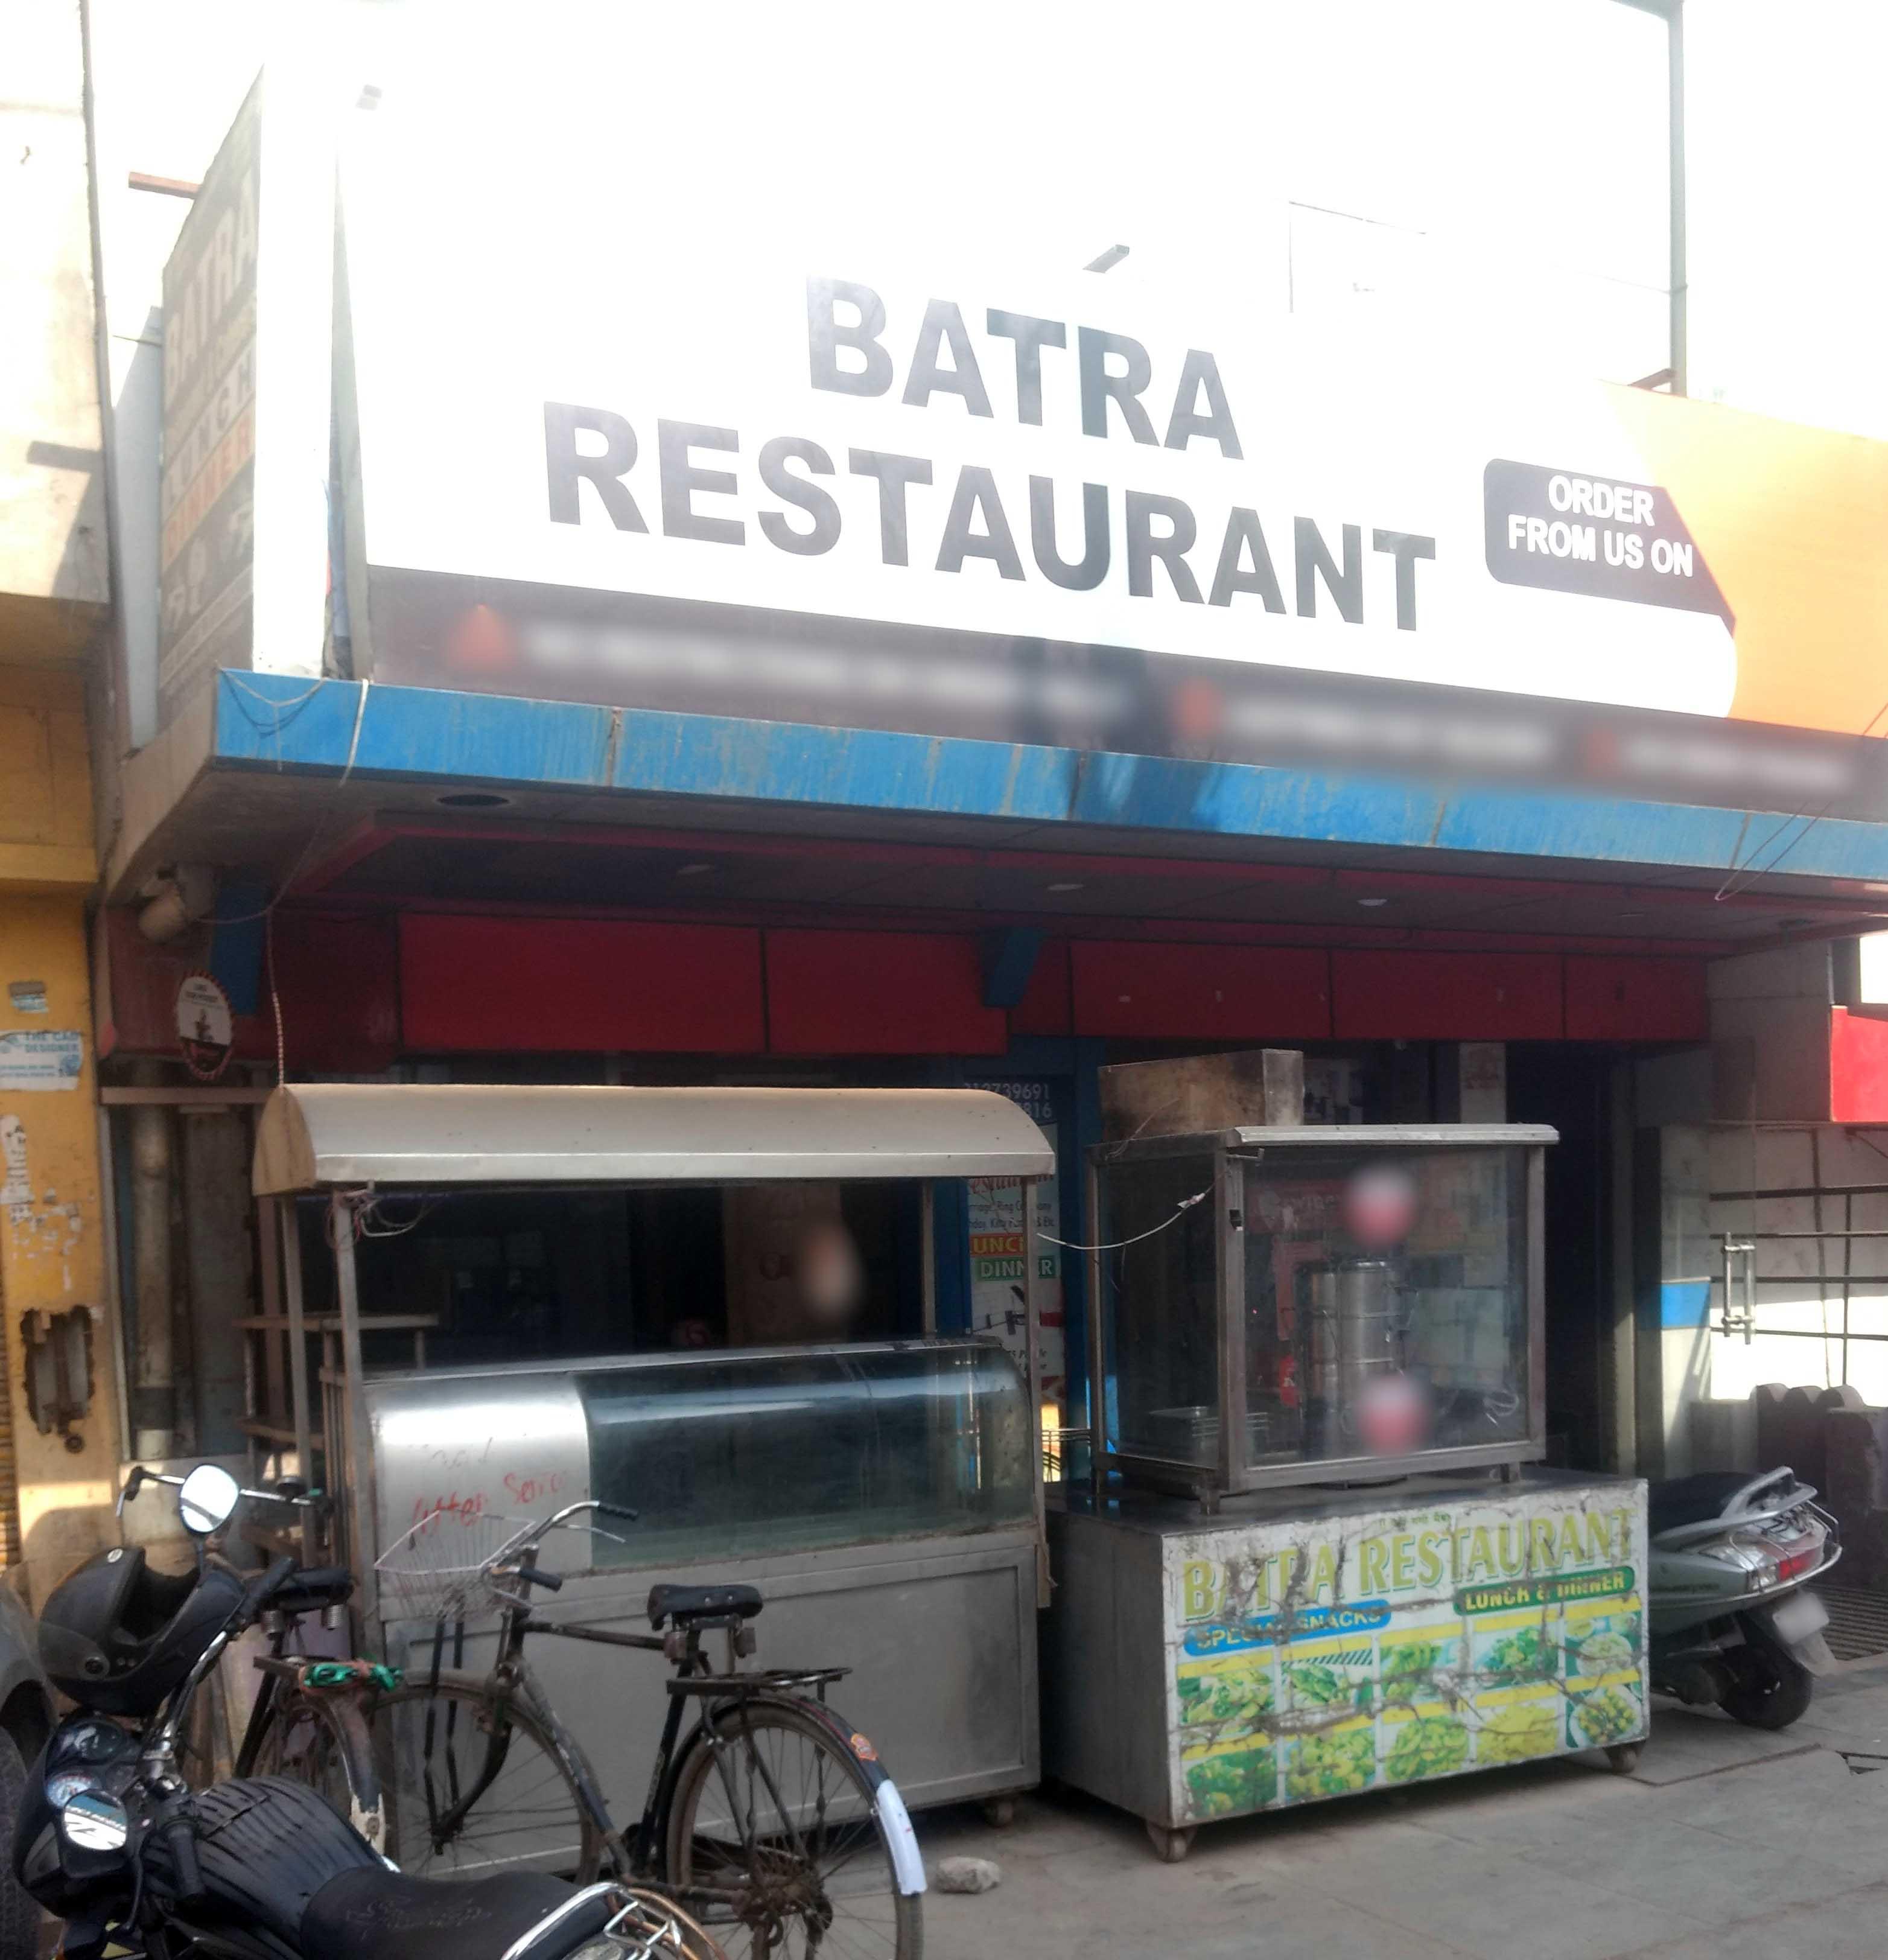 Batra Restaurant - NIT - Faridabad Image